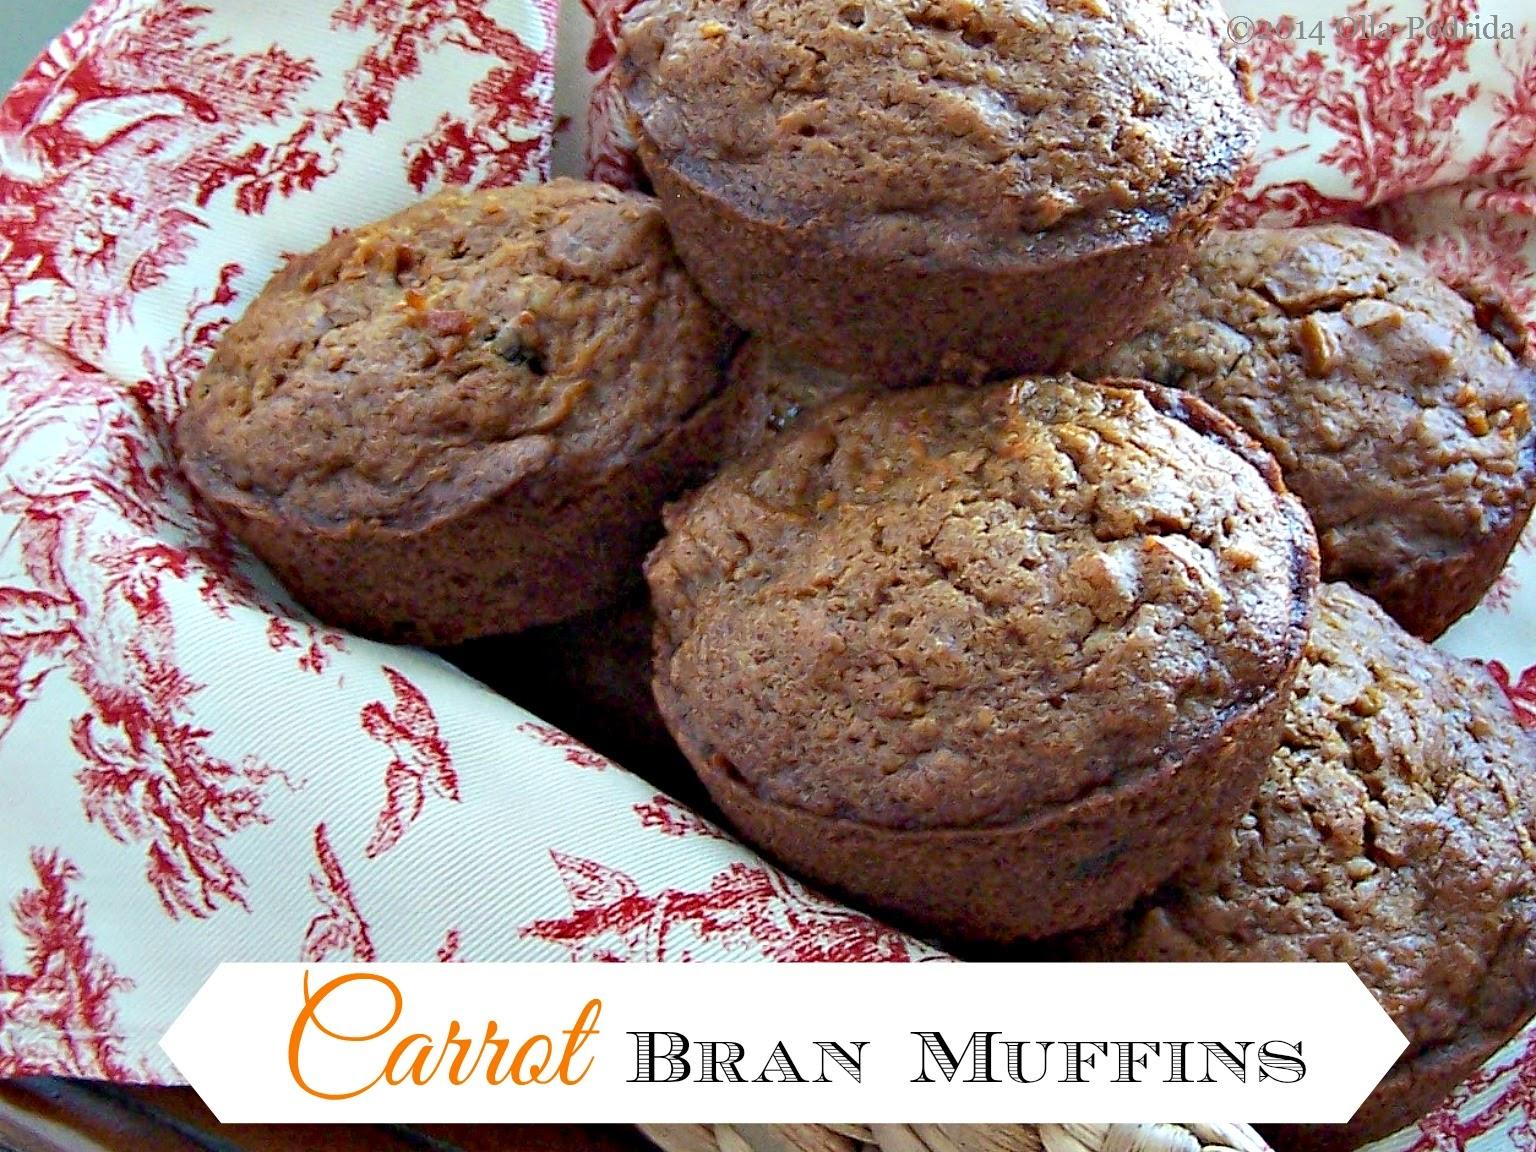 carrot bran muffins